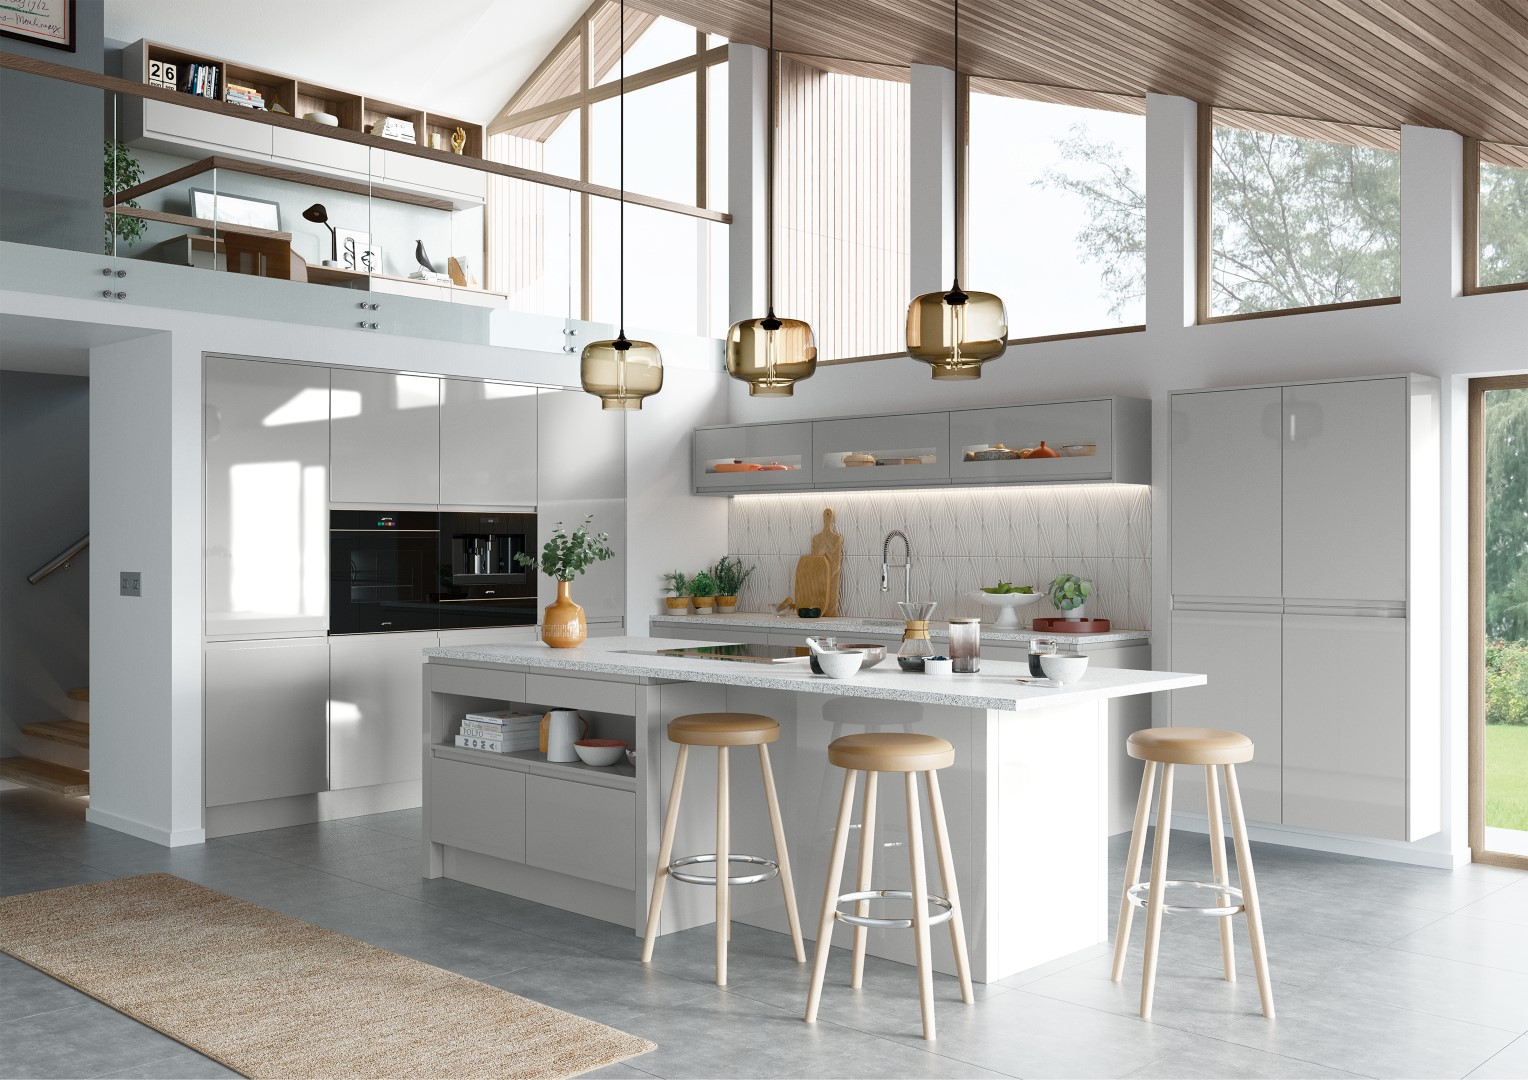 Strada Gloss Light Grey - Kitchen Design - Alan Kelly Kitchens - Waterford - 4